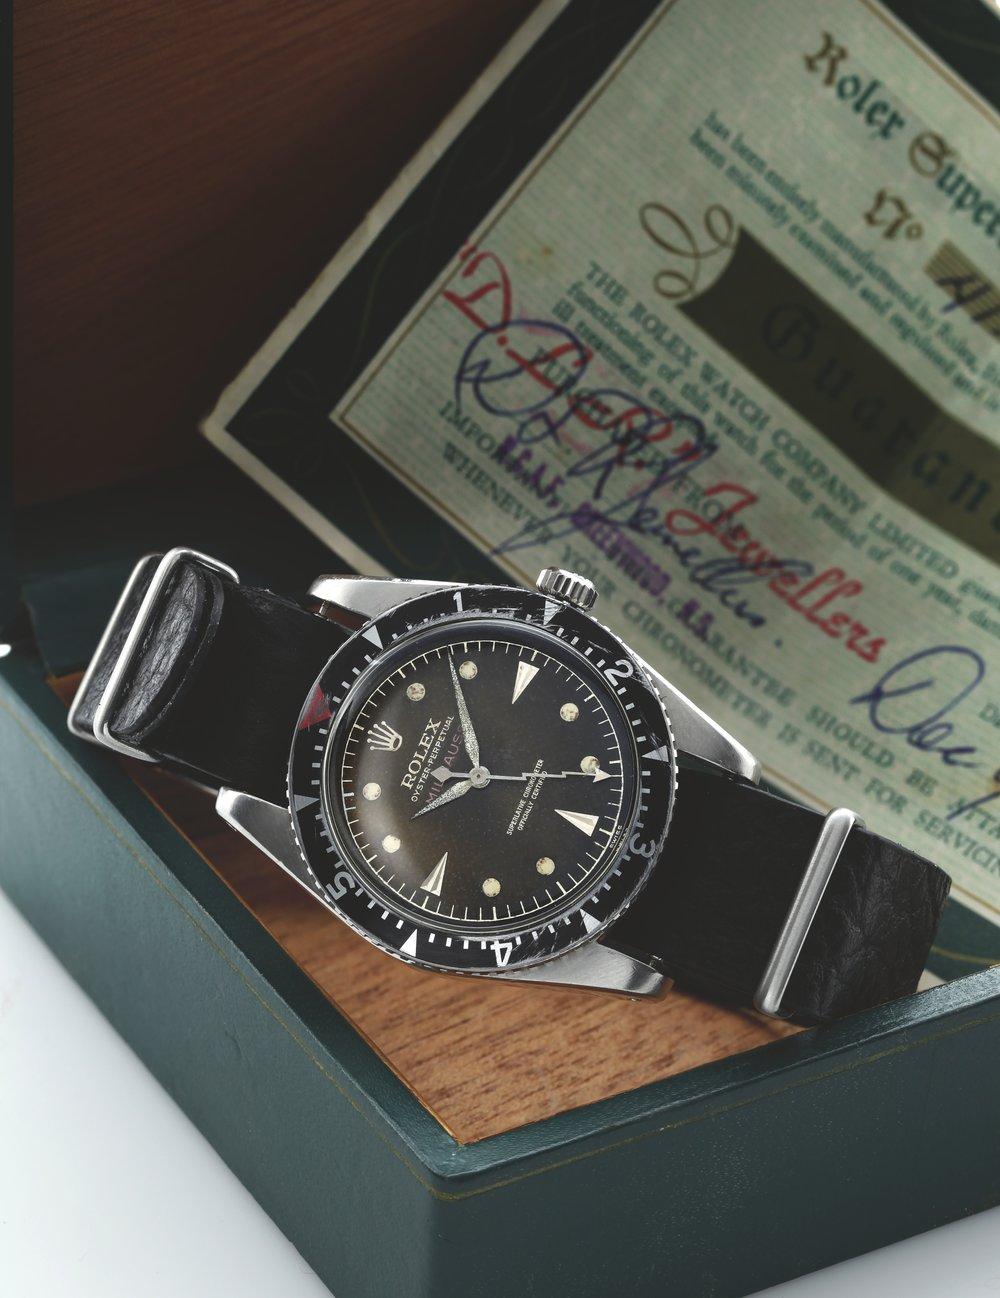 Rolex Milgauss Ref. 6541 circa 1956